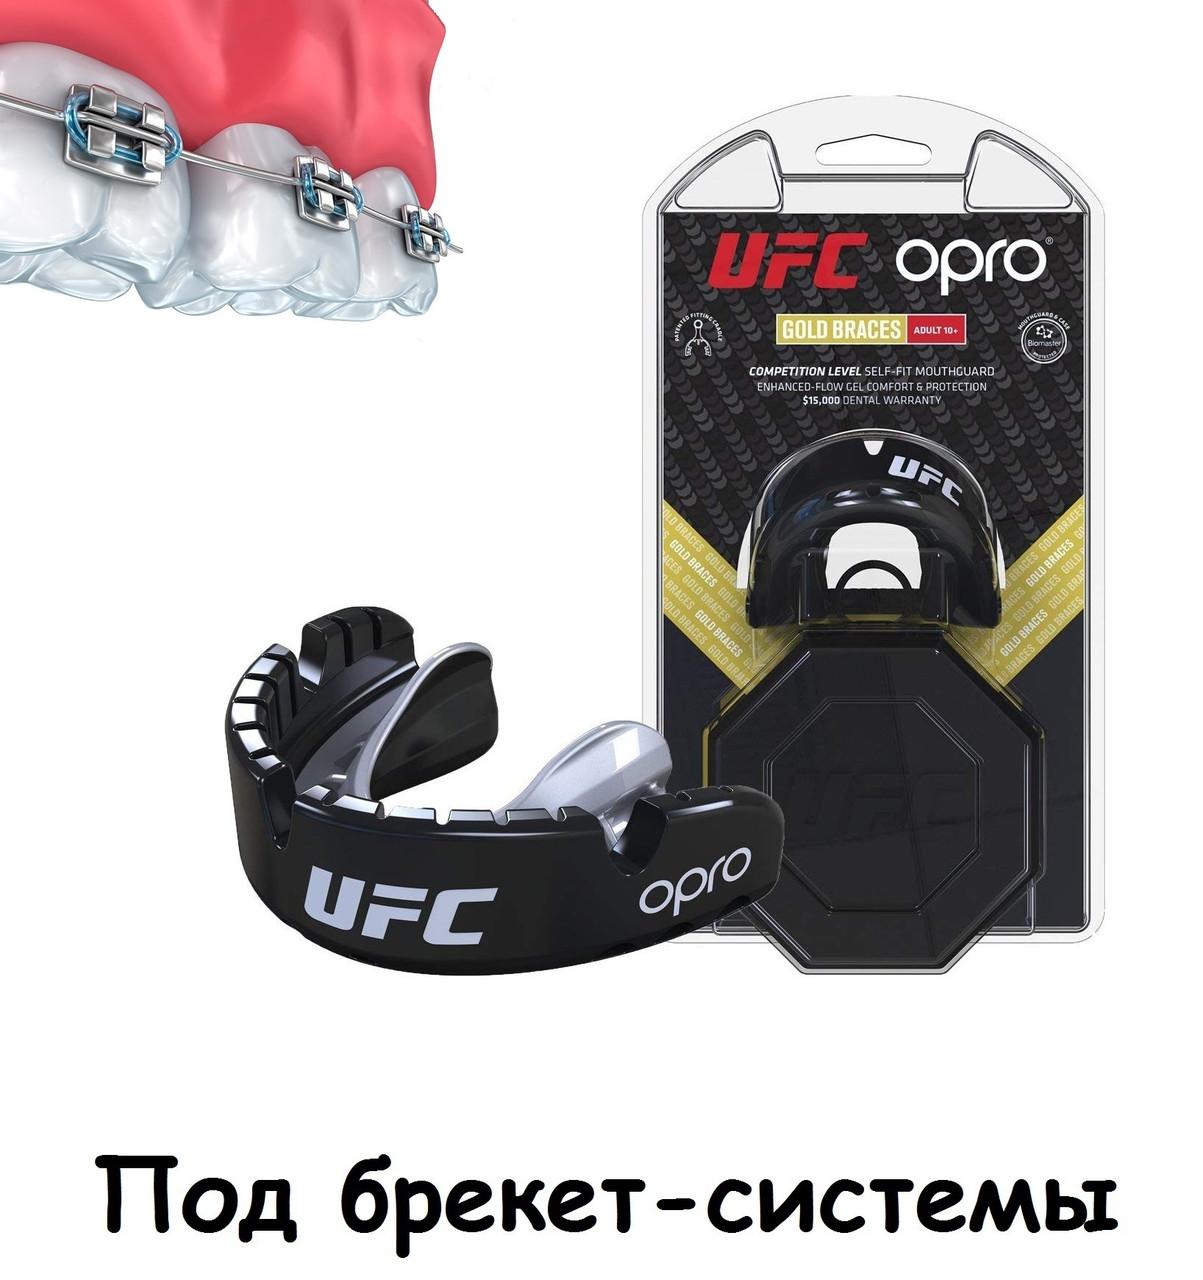 Капа OPRO Gold Braces UFC Hologram Black Metal/Silver (art.002262001)Чорно/Сірий